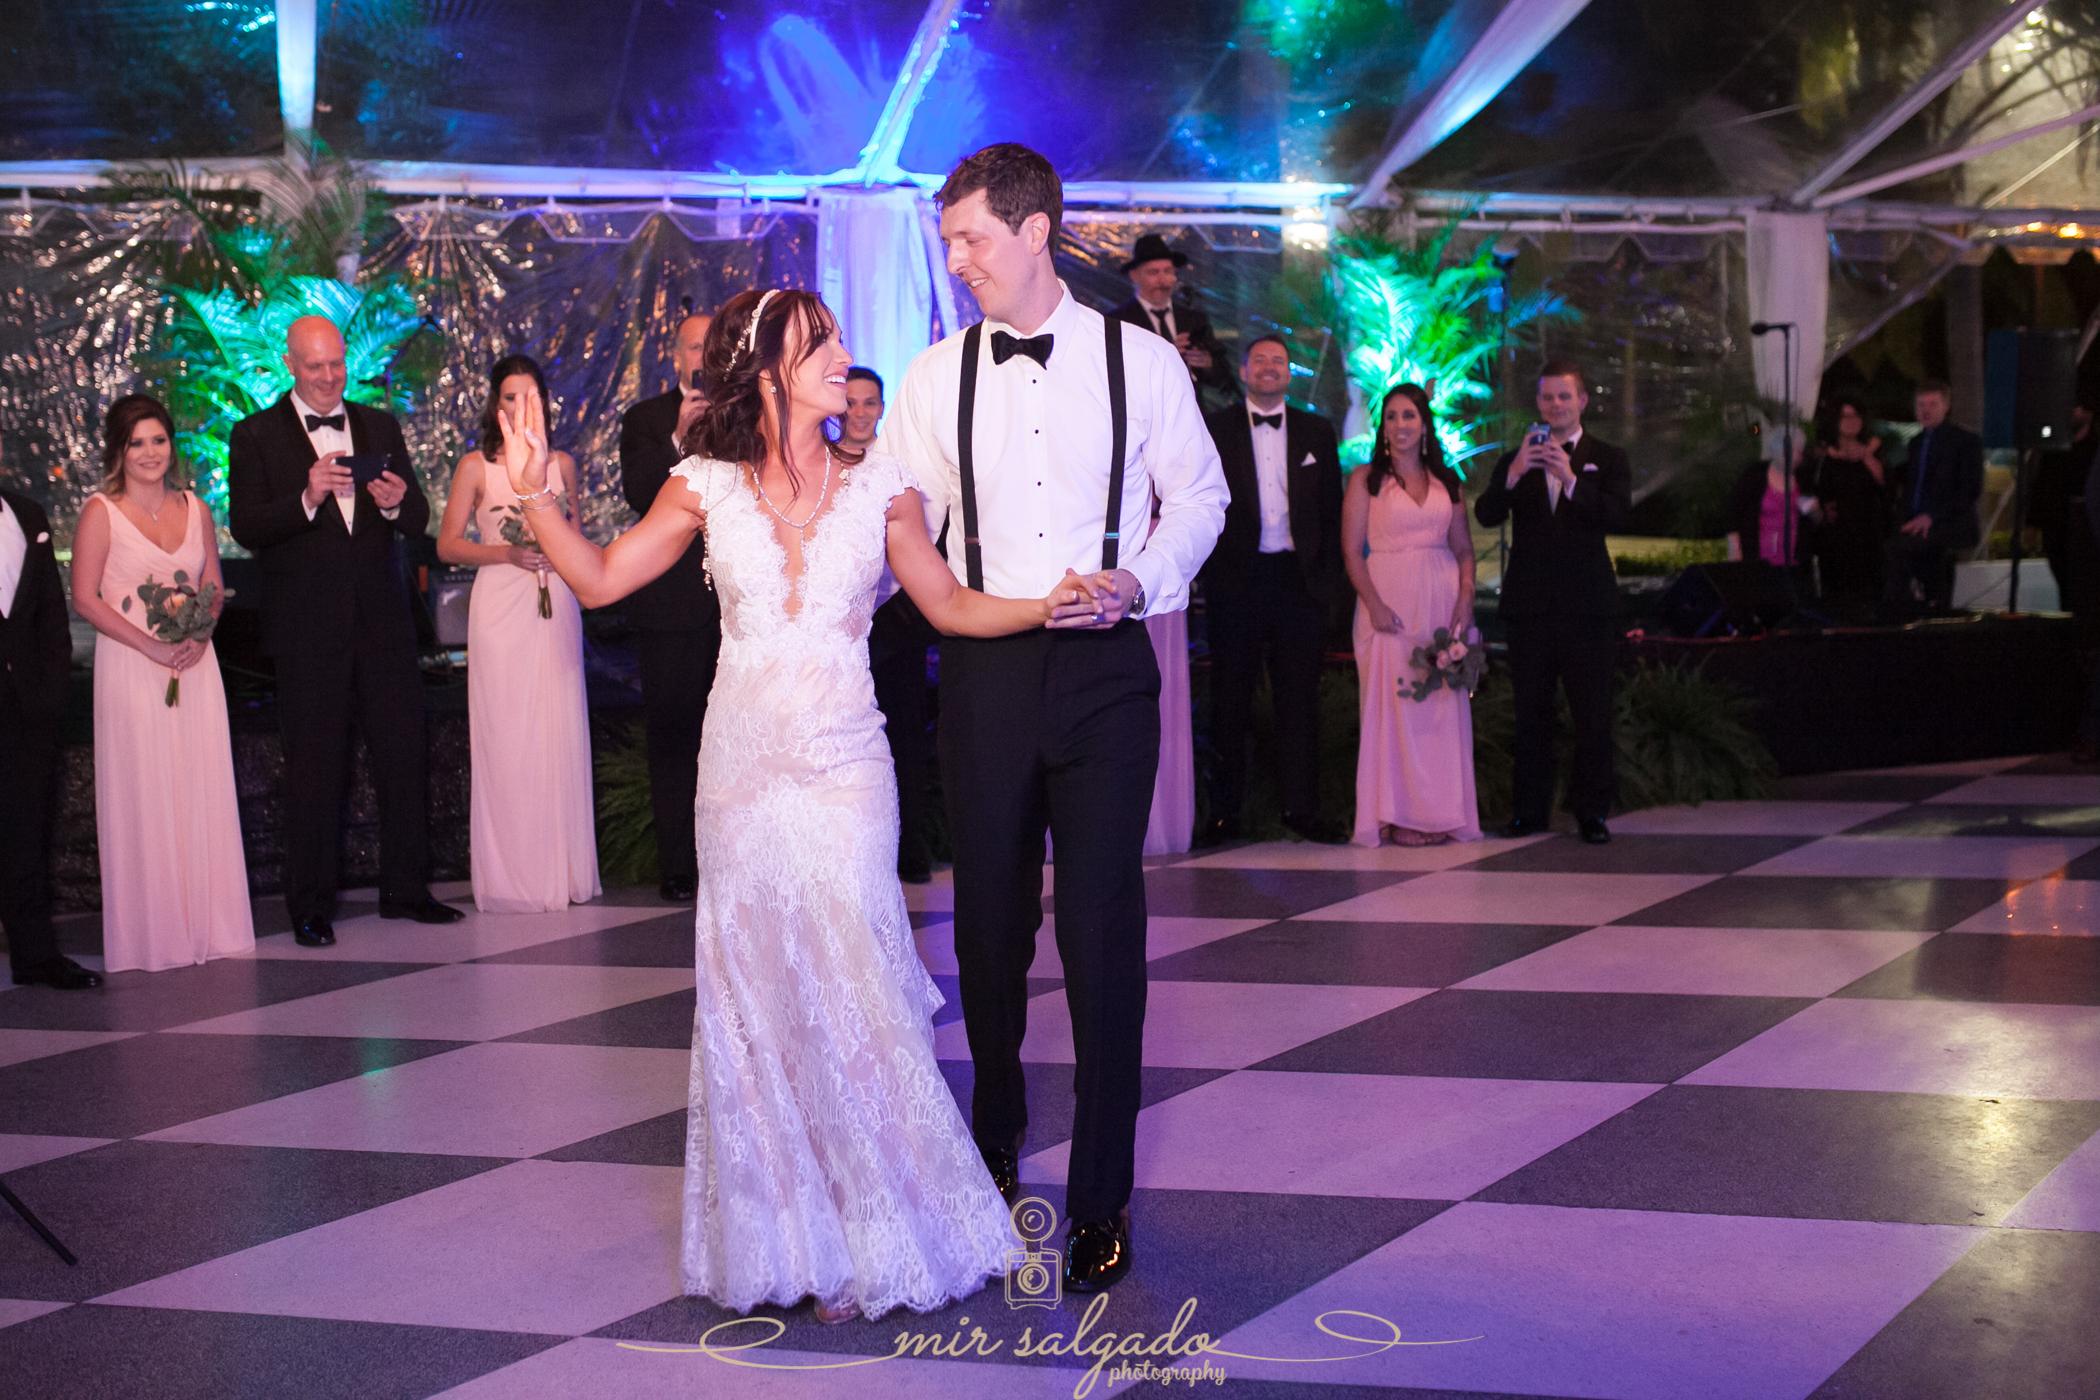 Tampa-first-dance-photo, Tampa-wedding-photo, Tampa-yacht-club-wedding